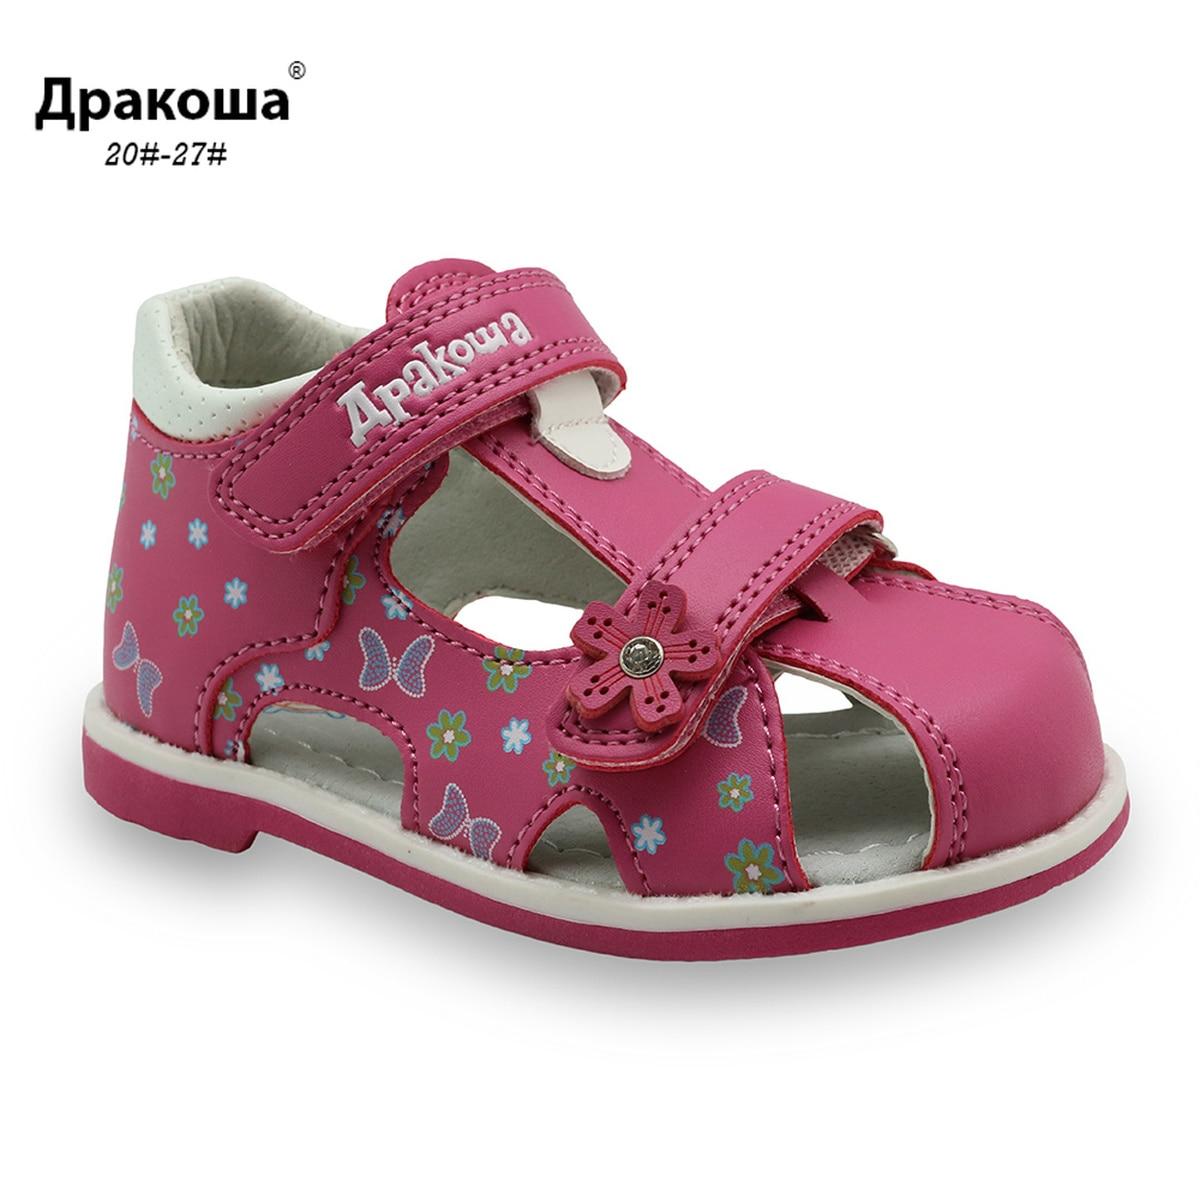 Apakowa Kids Sandals PU Double Hook&Loop Summer Sandals Cute Flower Print Arch Support Girls Toddler Sandals Children's Shoes